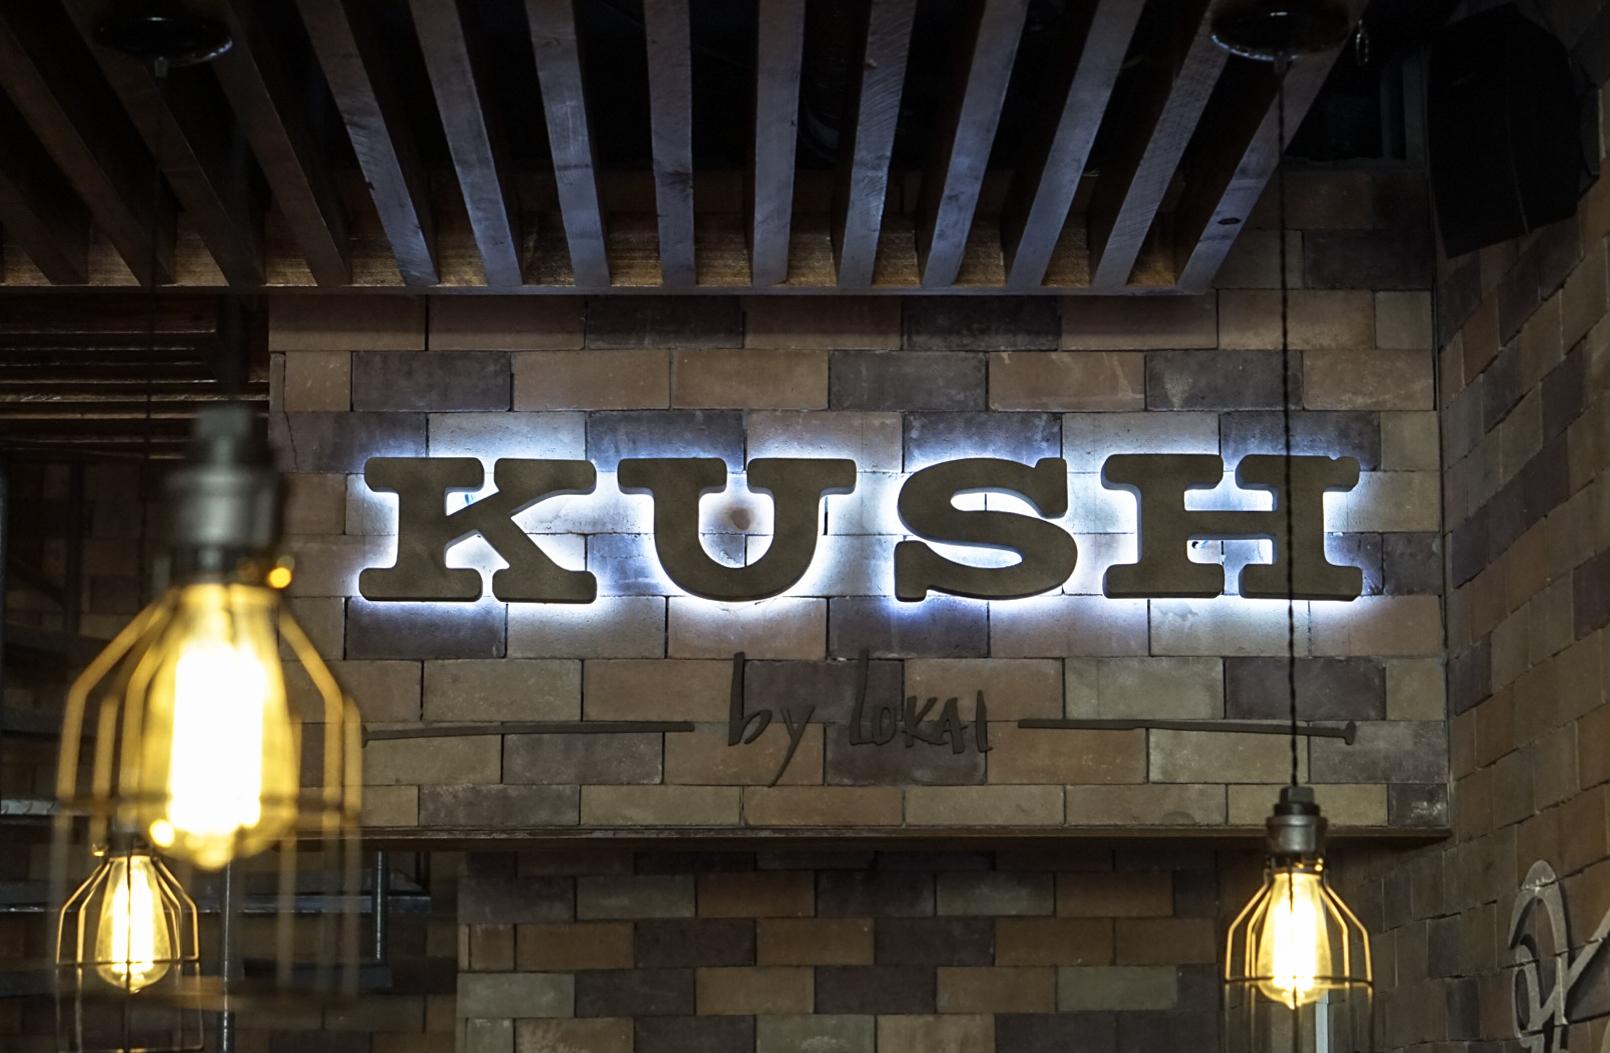 restaurant-design-kuwait-kush (7) copy.jpg